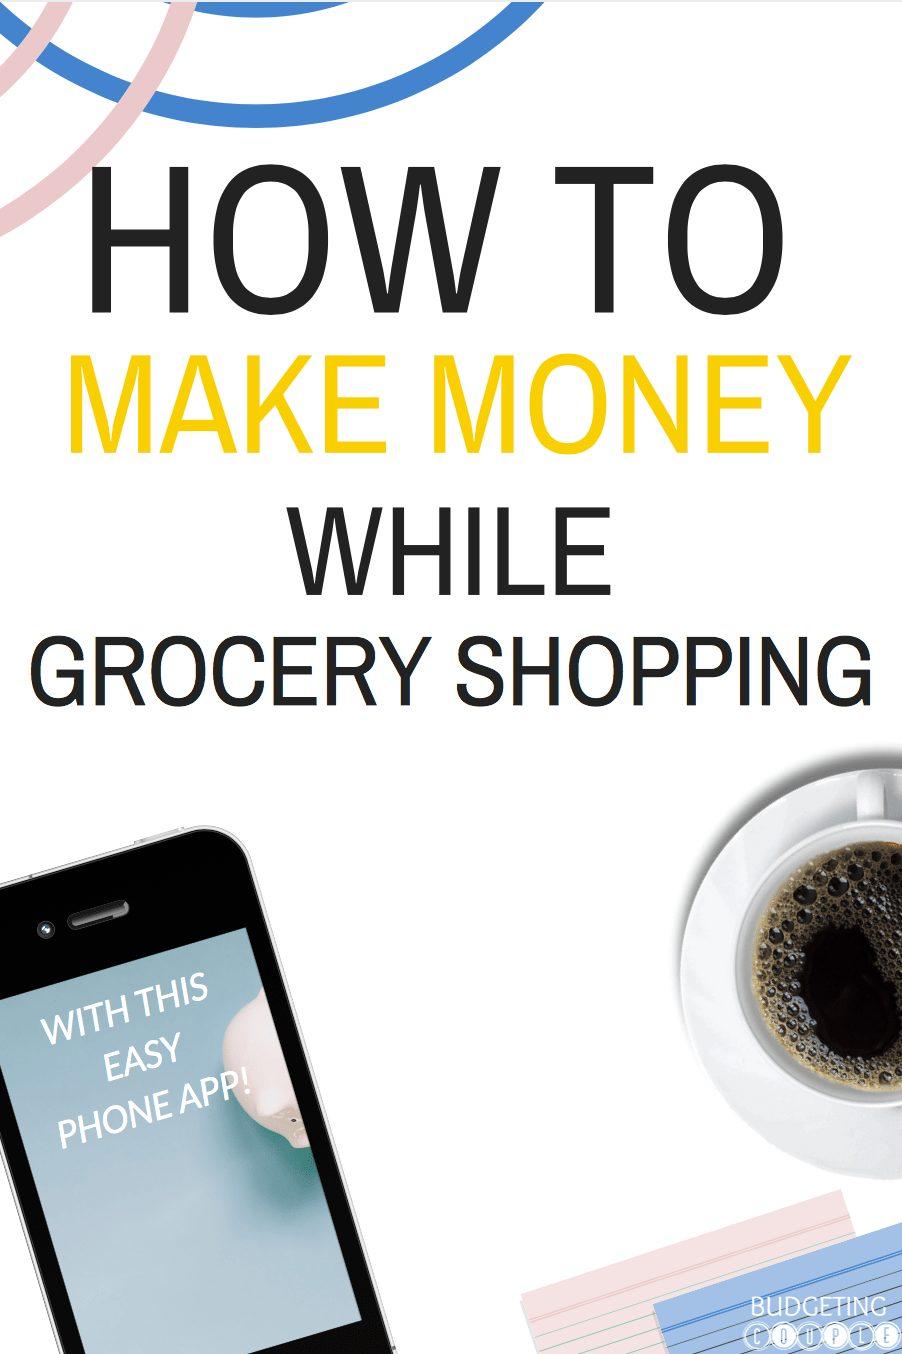 how to make money, make money, save money, money saving app, money saving tips, how to save money, frugal living,